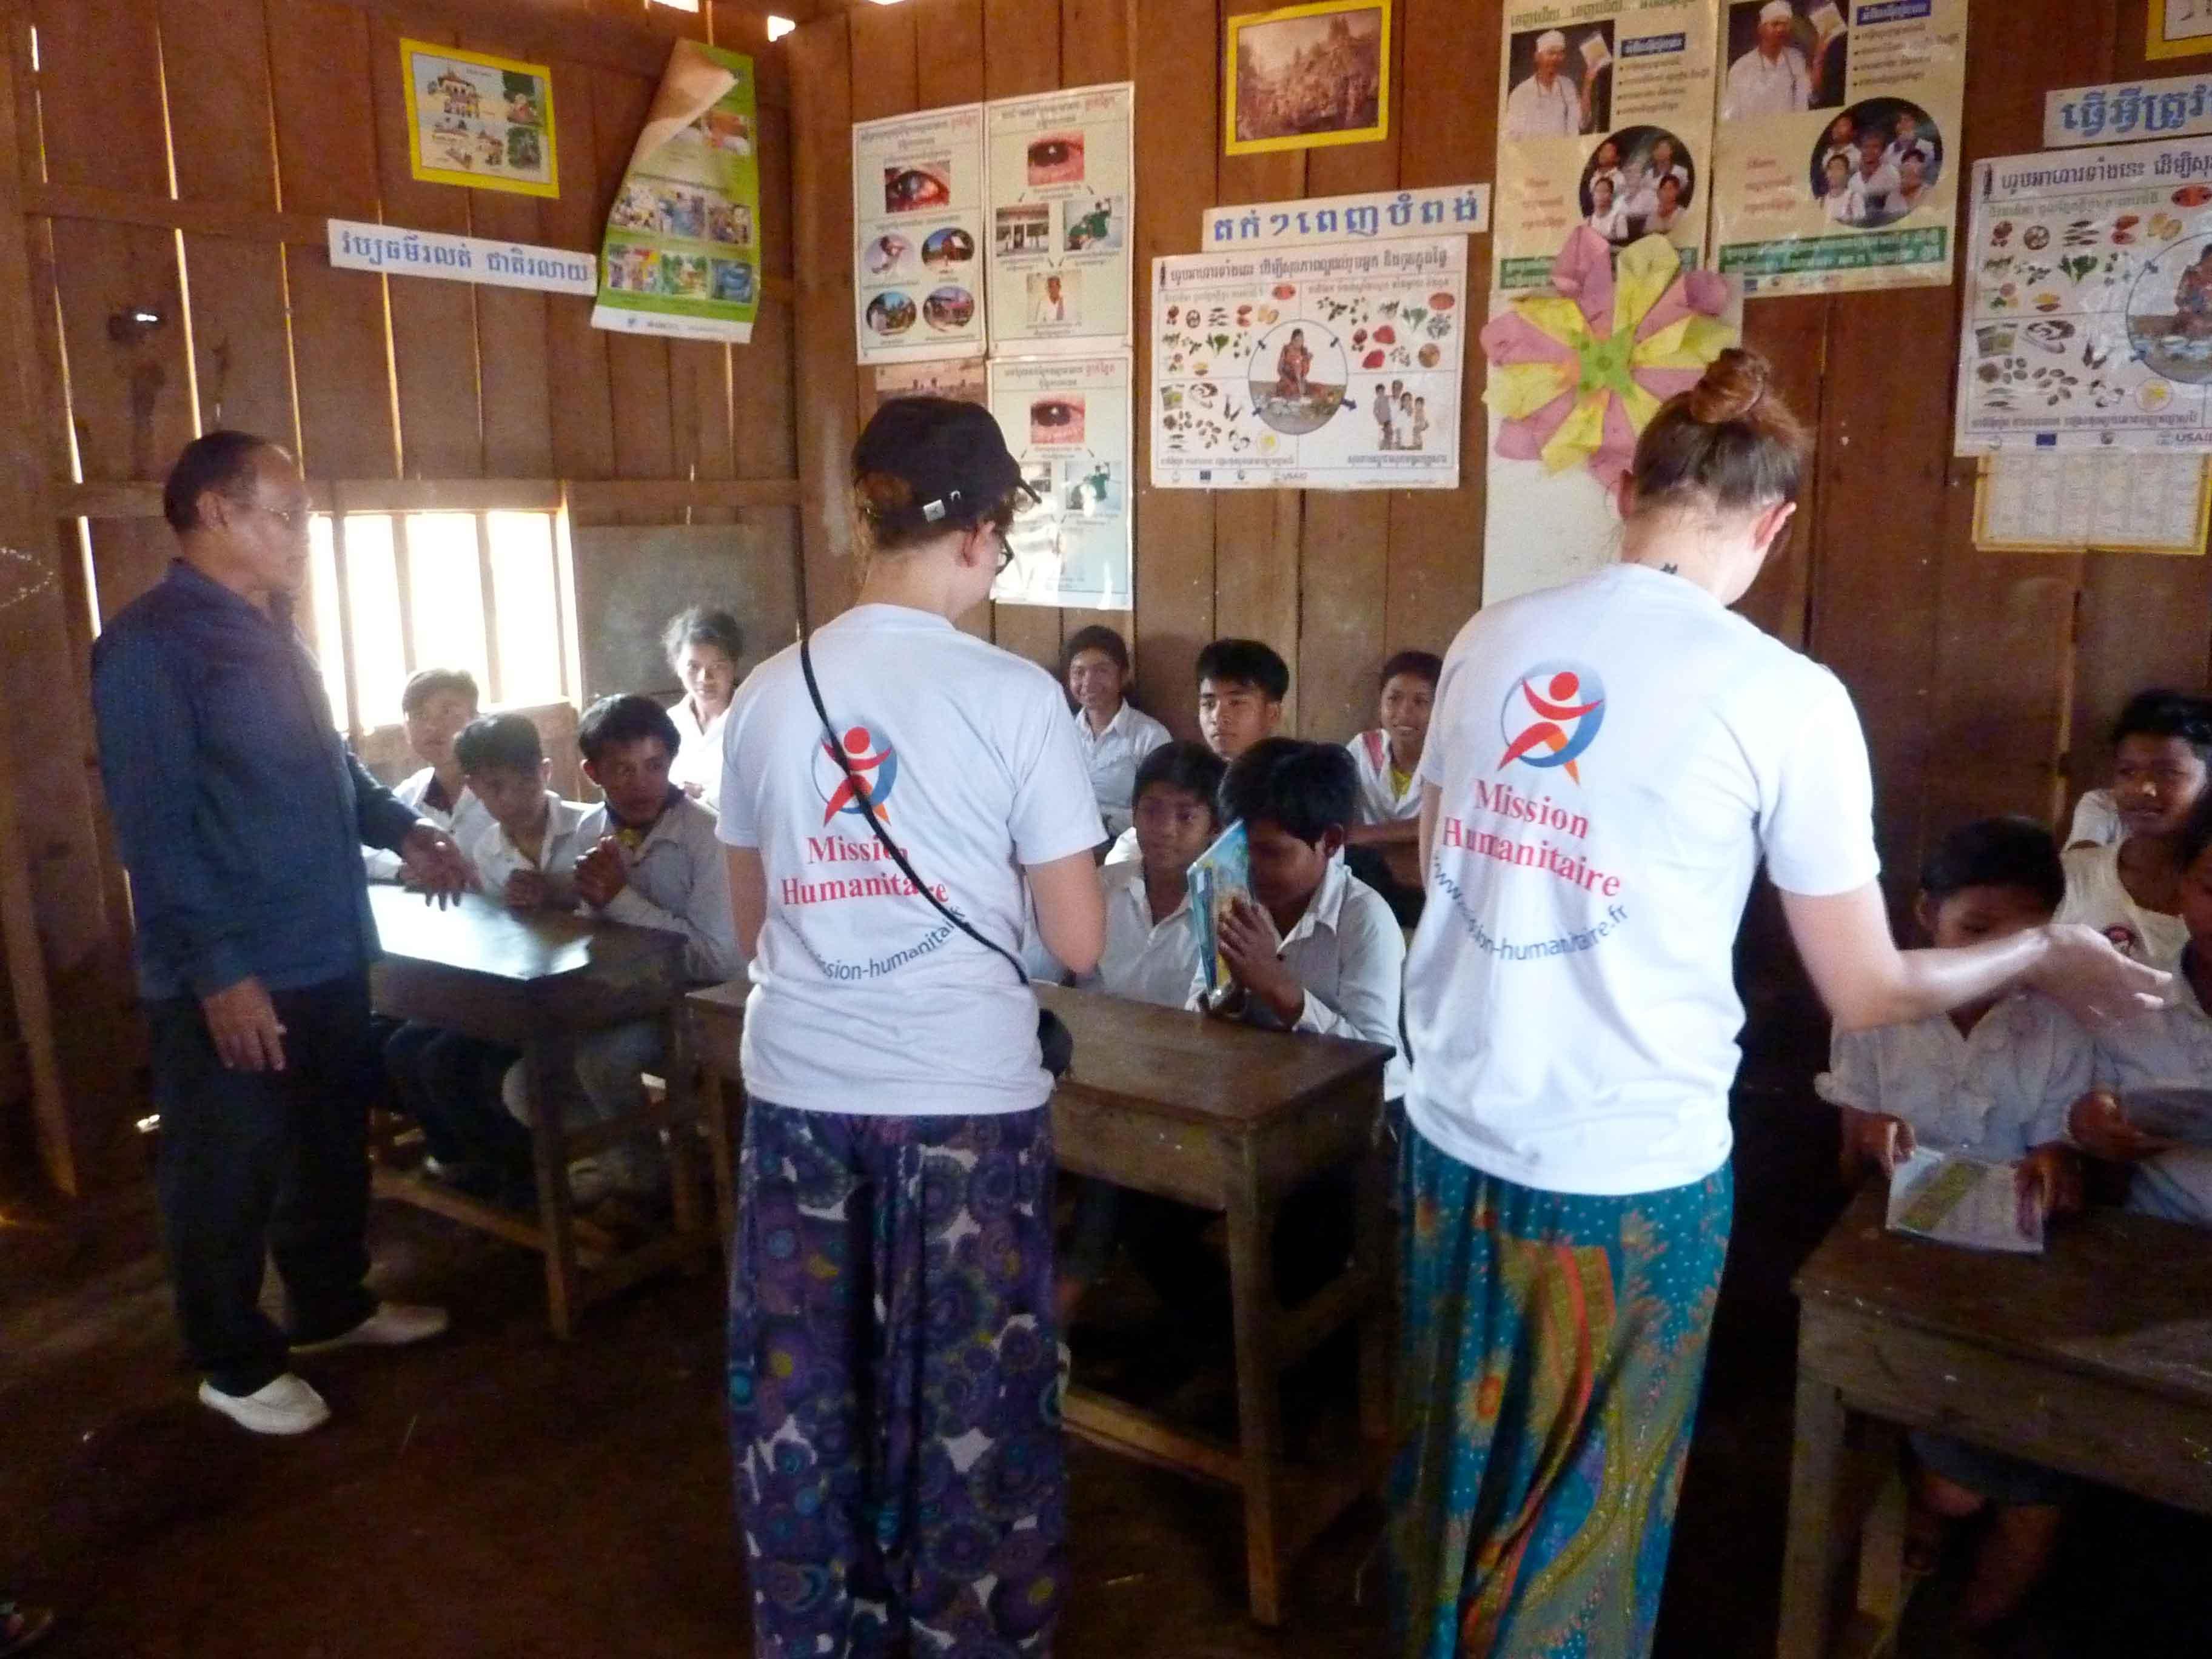 Mission Humanitaire Organisation De Solidarite Internationale